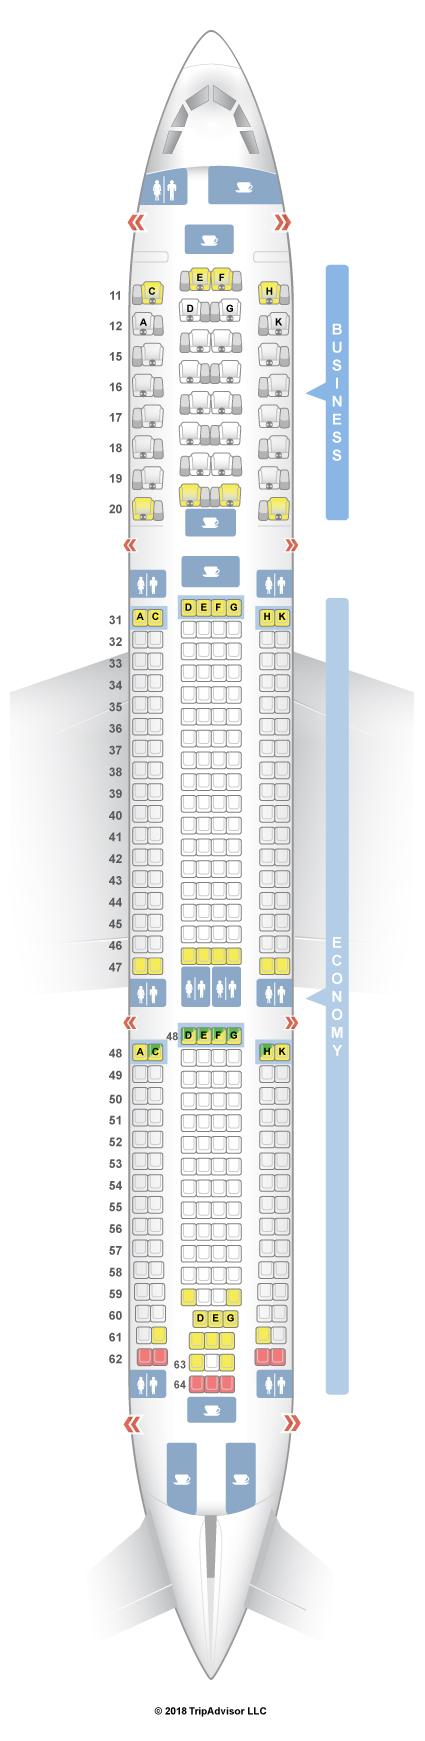 SeatGuru Seat Map Hong Kong Airlines - SeatGuru